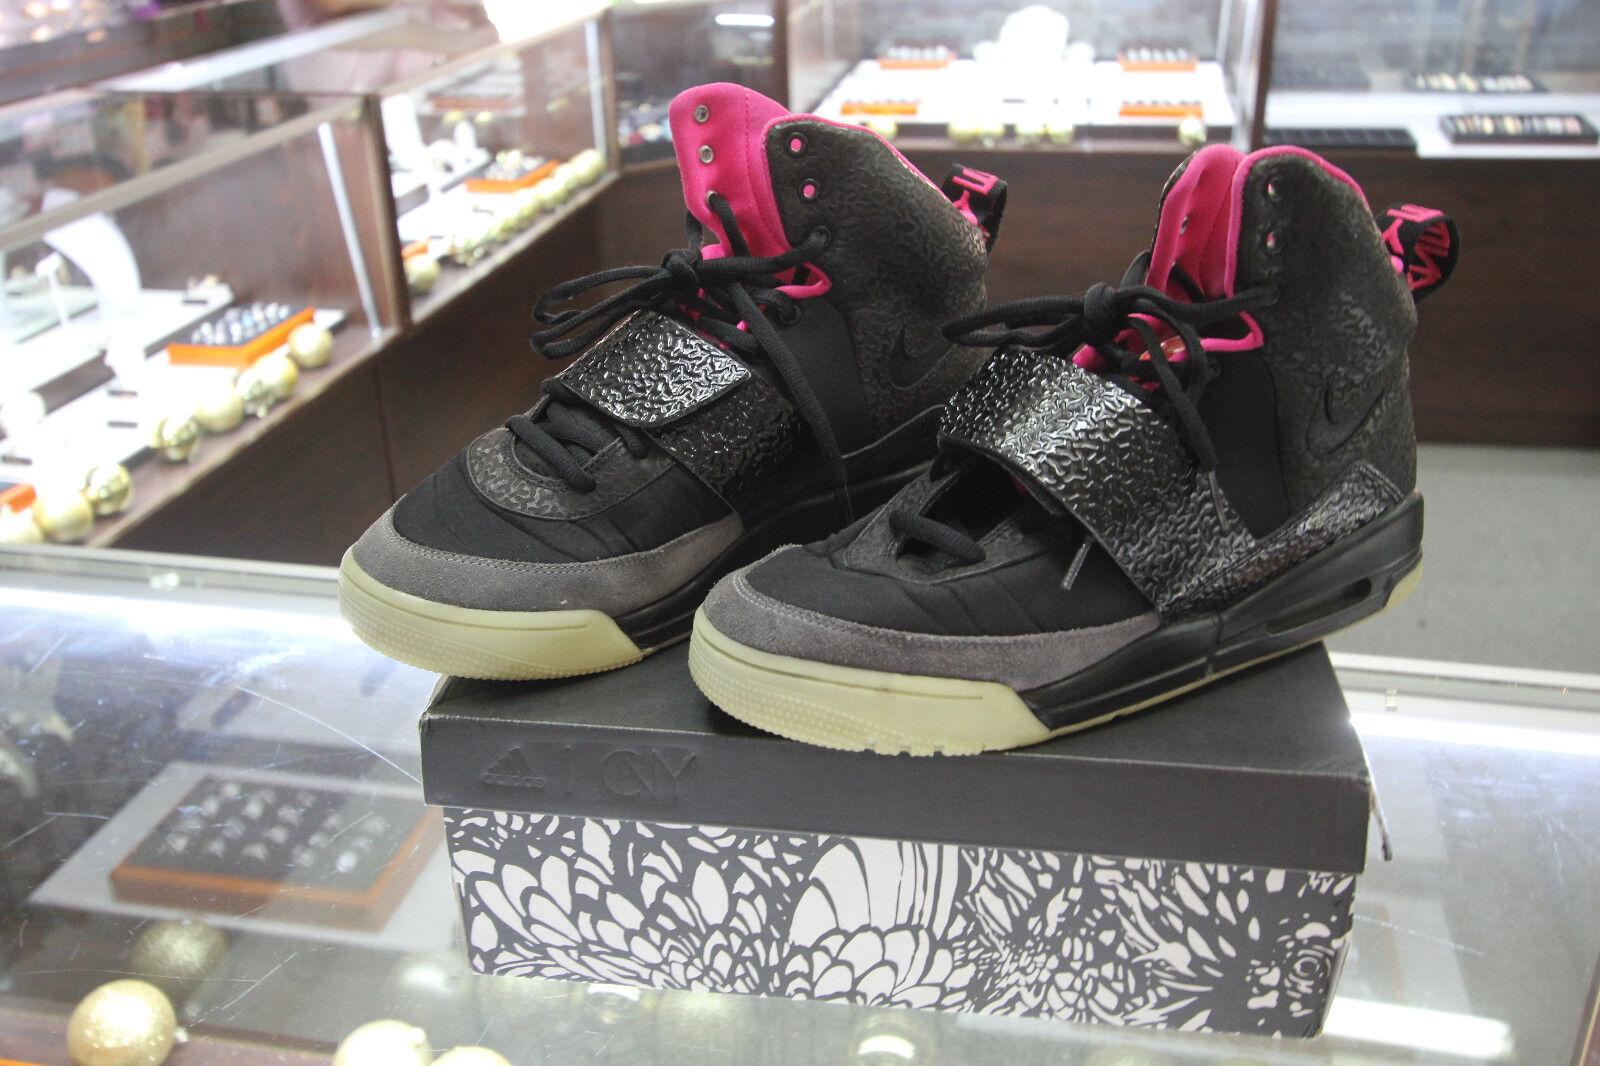 Nike air taglia yeezy 1 batter nero taglia air 11 rosa 366164-003 2009 24e616